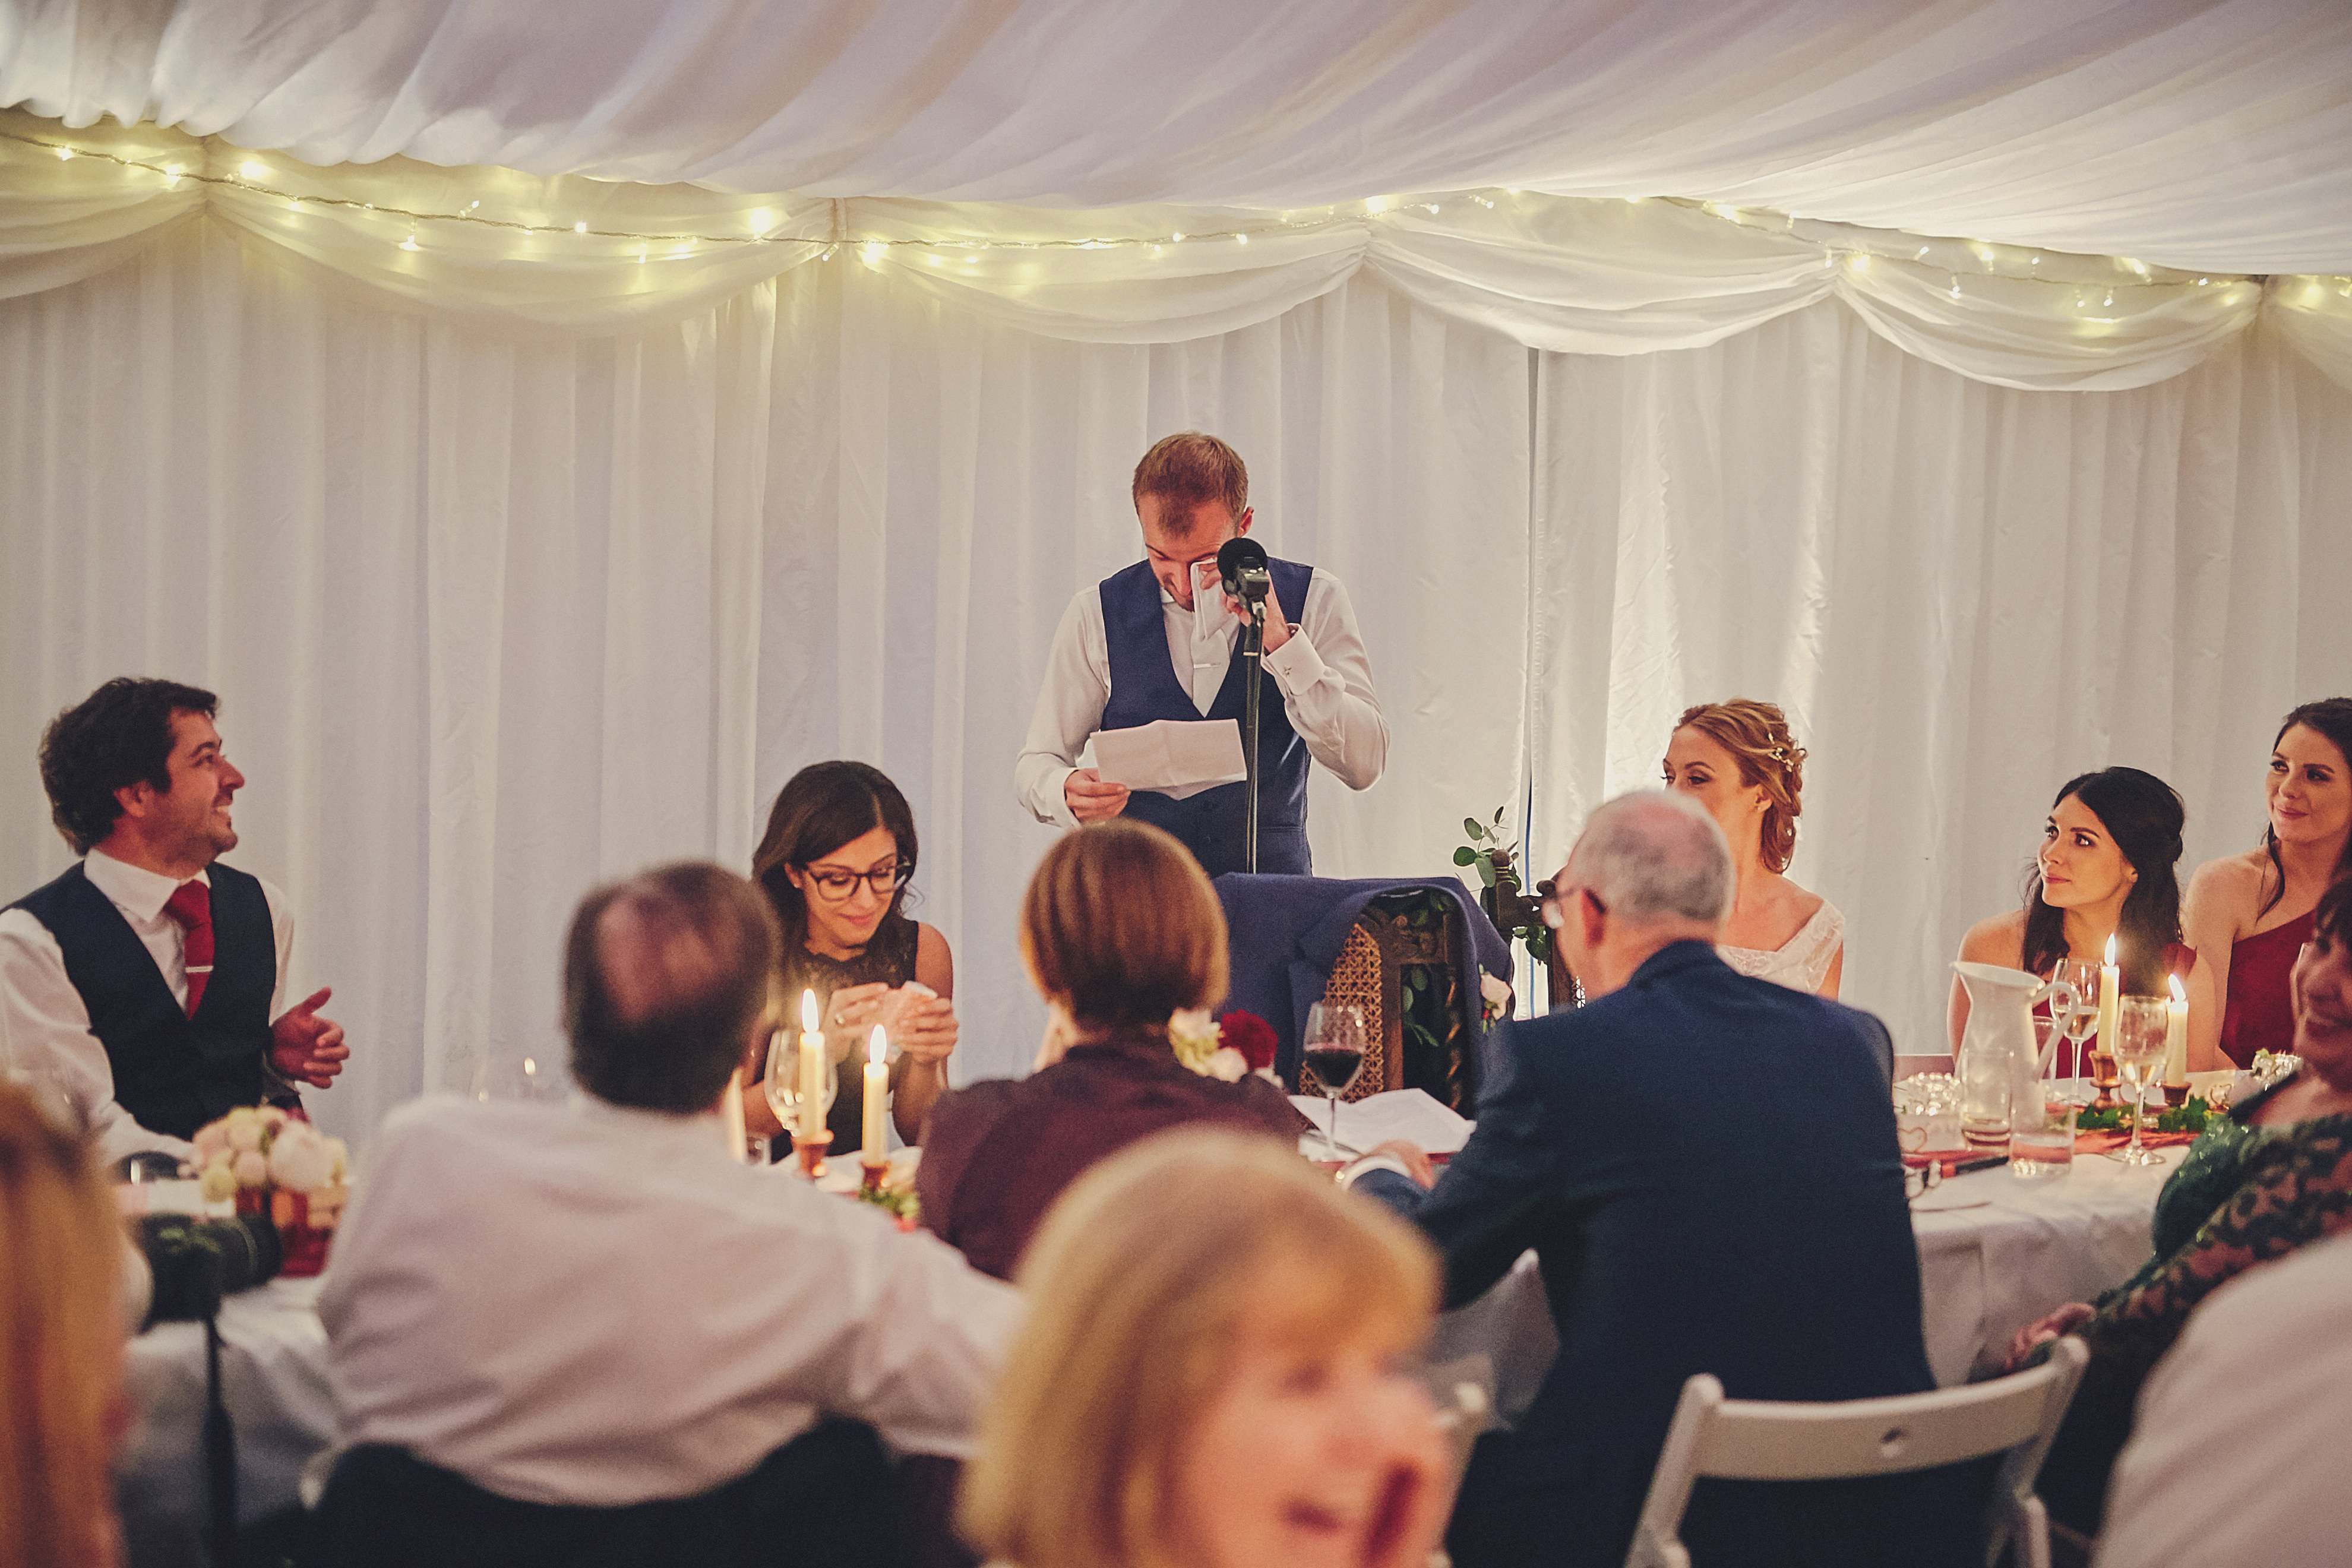 Cloughjordan House weddding142 - Cloughjordan House Wedding - Alternative Venue